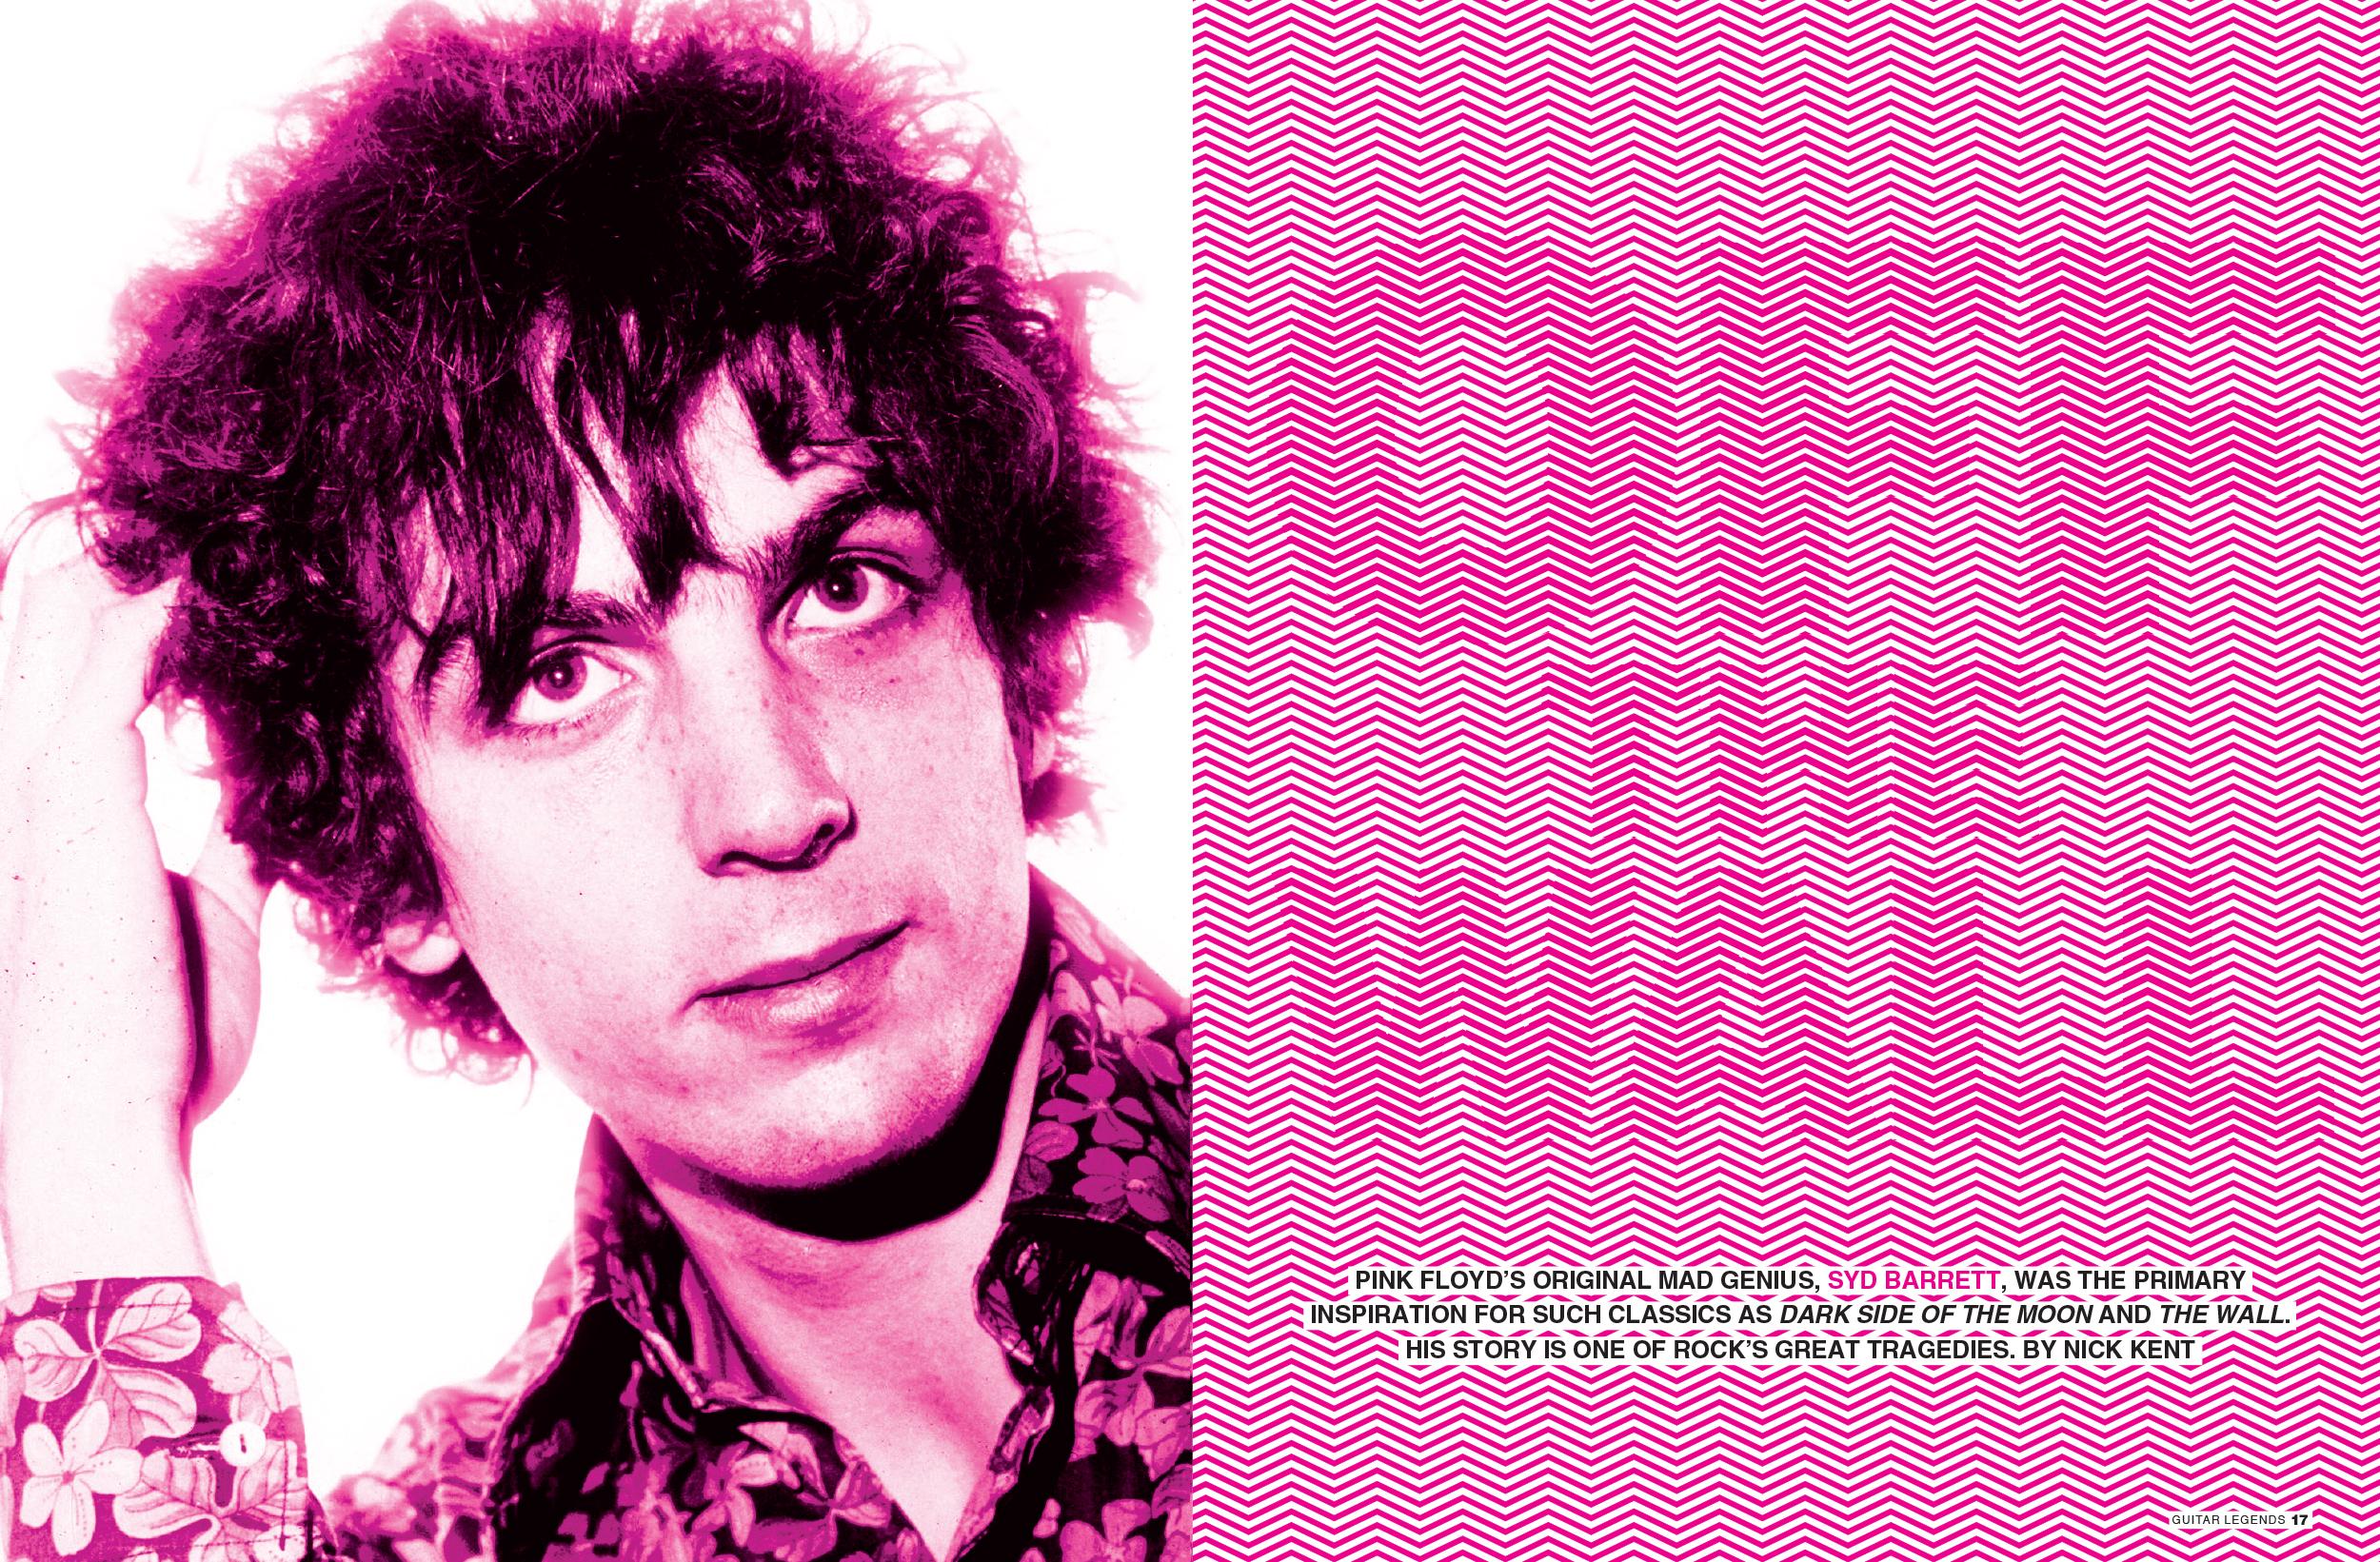 01_03_12 Syd Barrett_LARGE.png